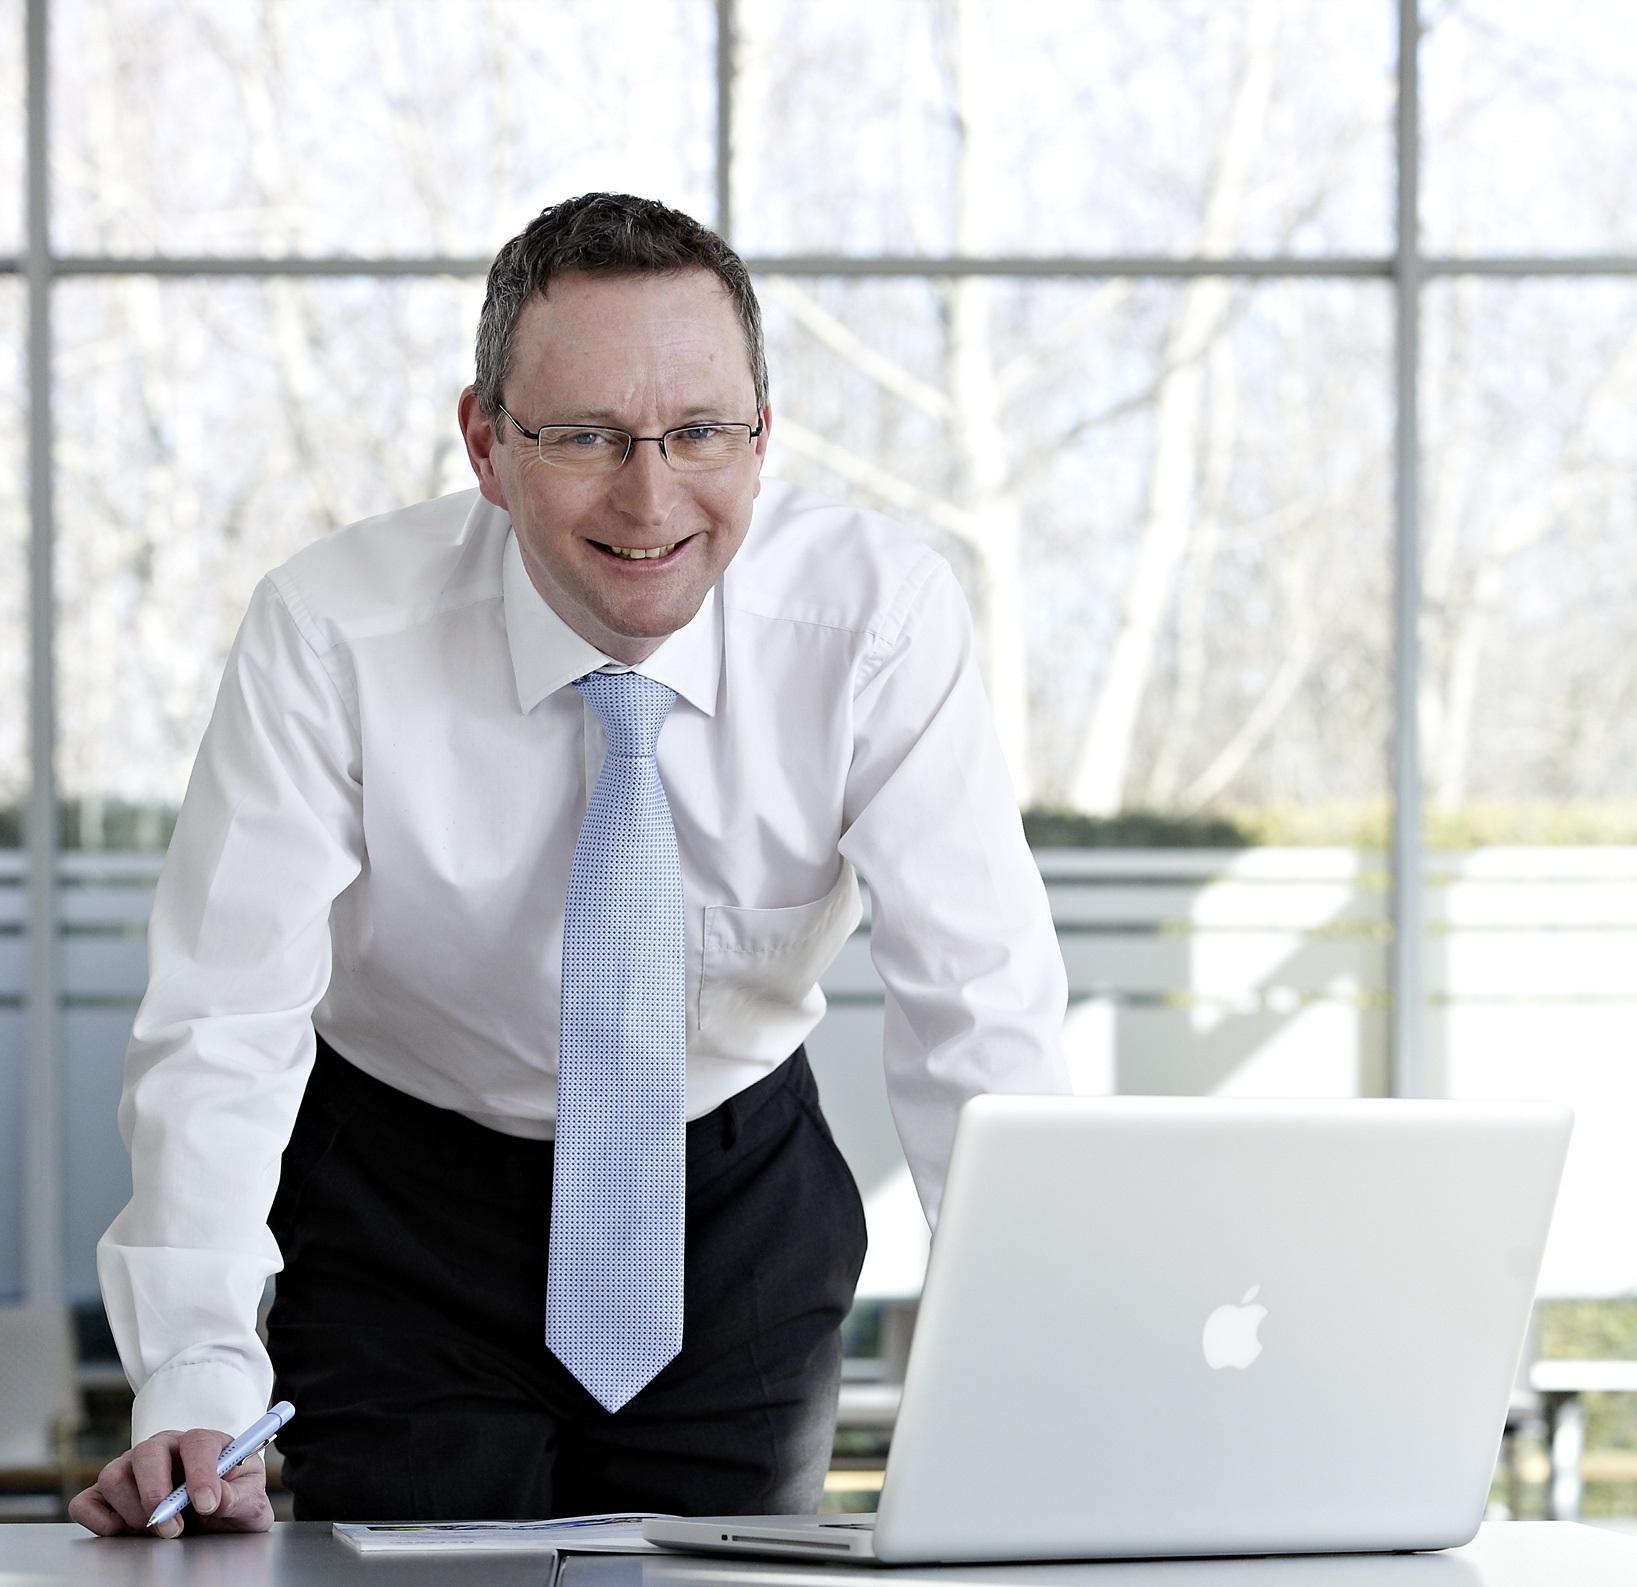 Roger Willis, Leiter Geschäftsfeld Chemie & Papier, Netzsch